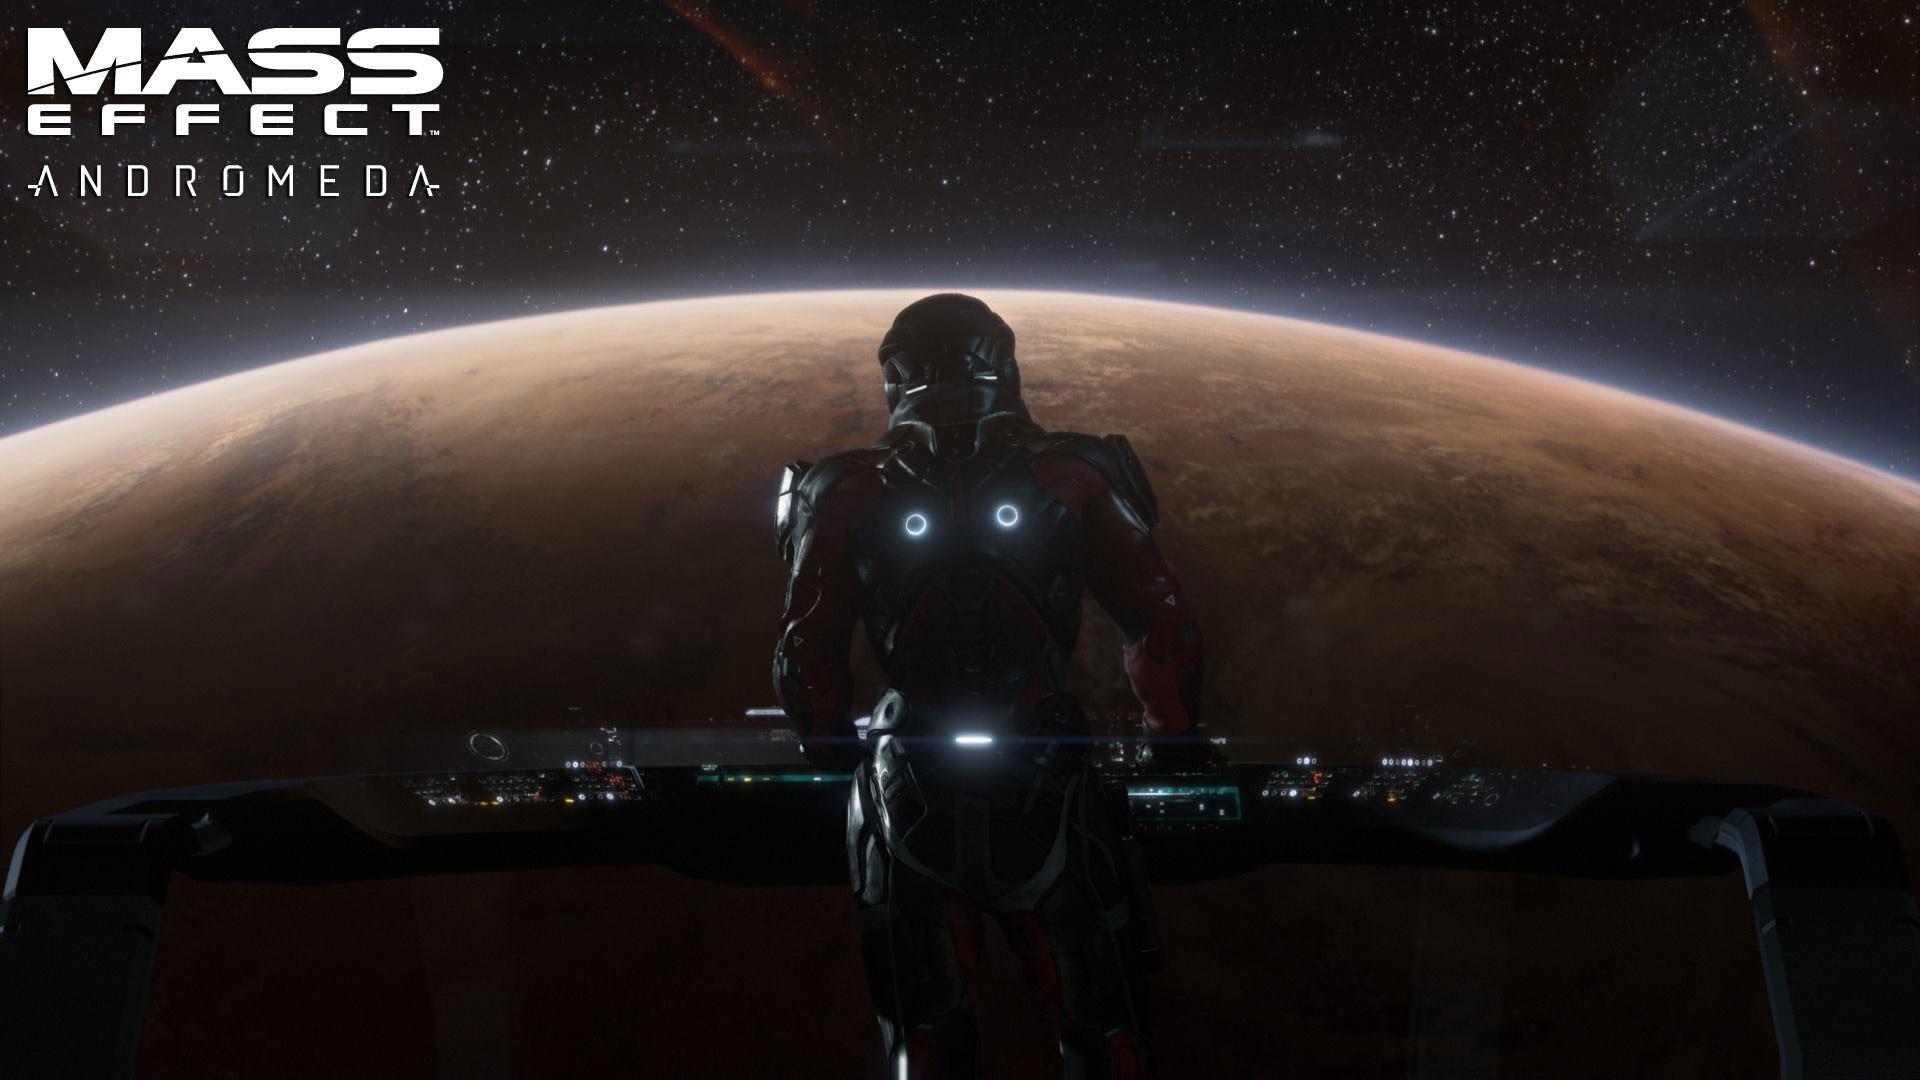 BioWare Reveals Mass Effect: Andromeda Release Date